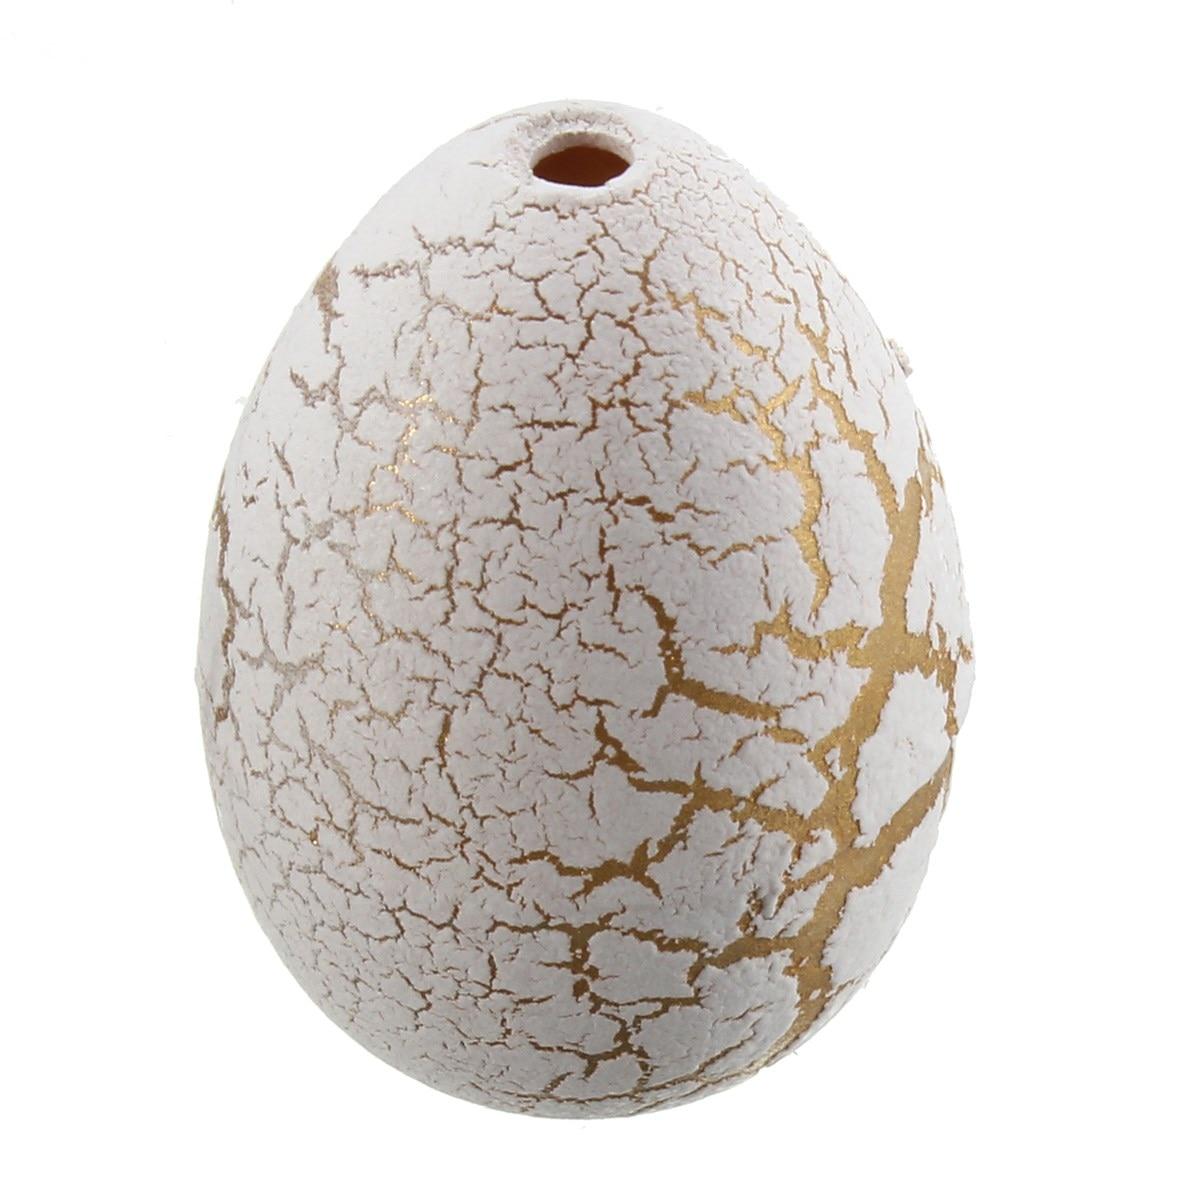 NEW 6PCS/lot Best Hatching Growing Dinosaur Dino Eggs Add Water Magic Cute Children Kids Toy